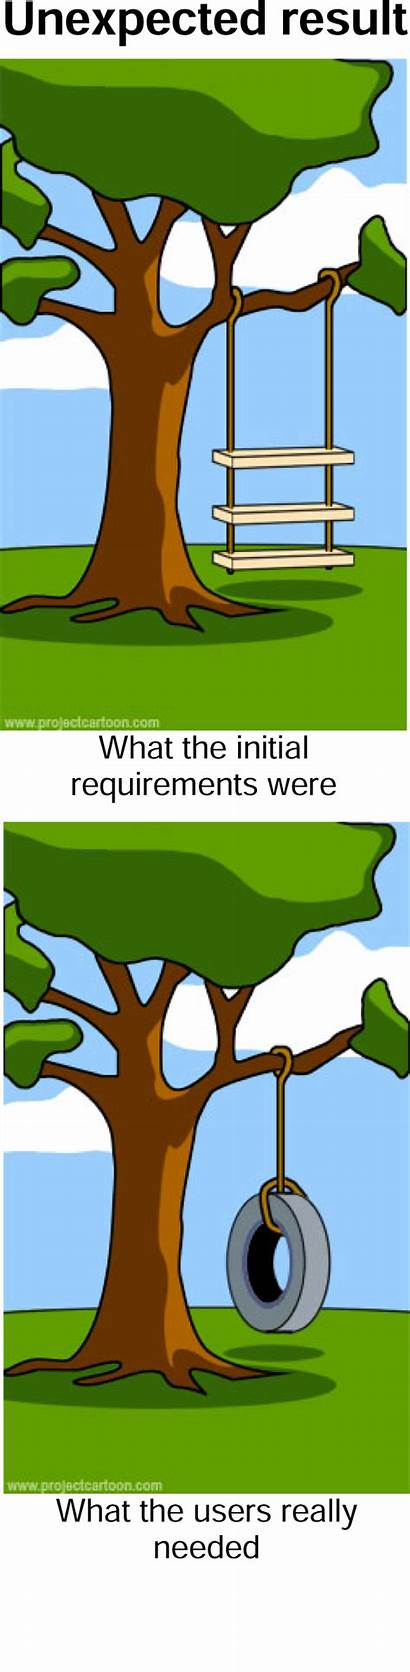 Development Agile Waterfall Software Project Methodology Choose